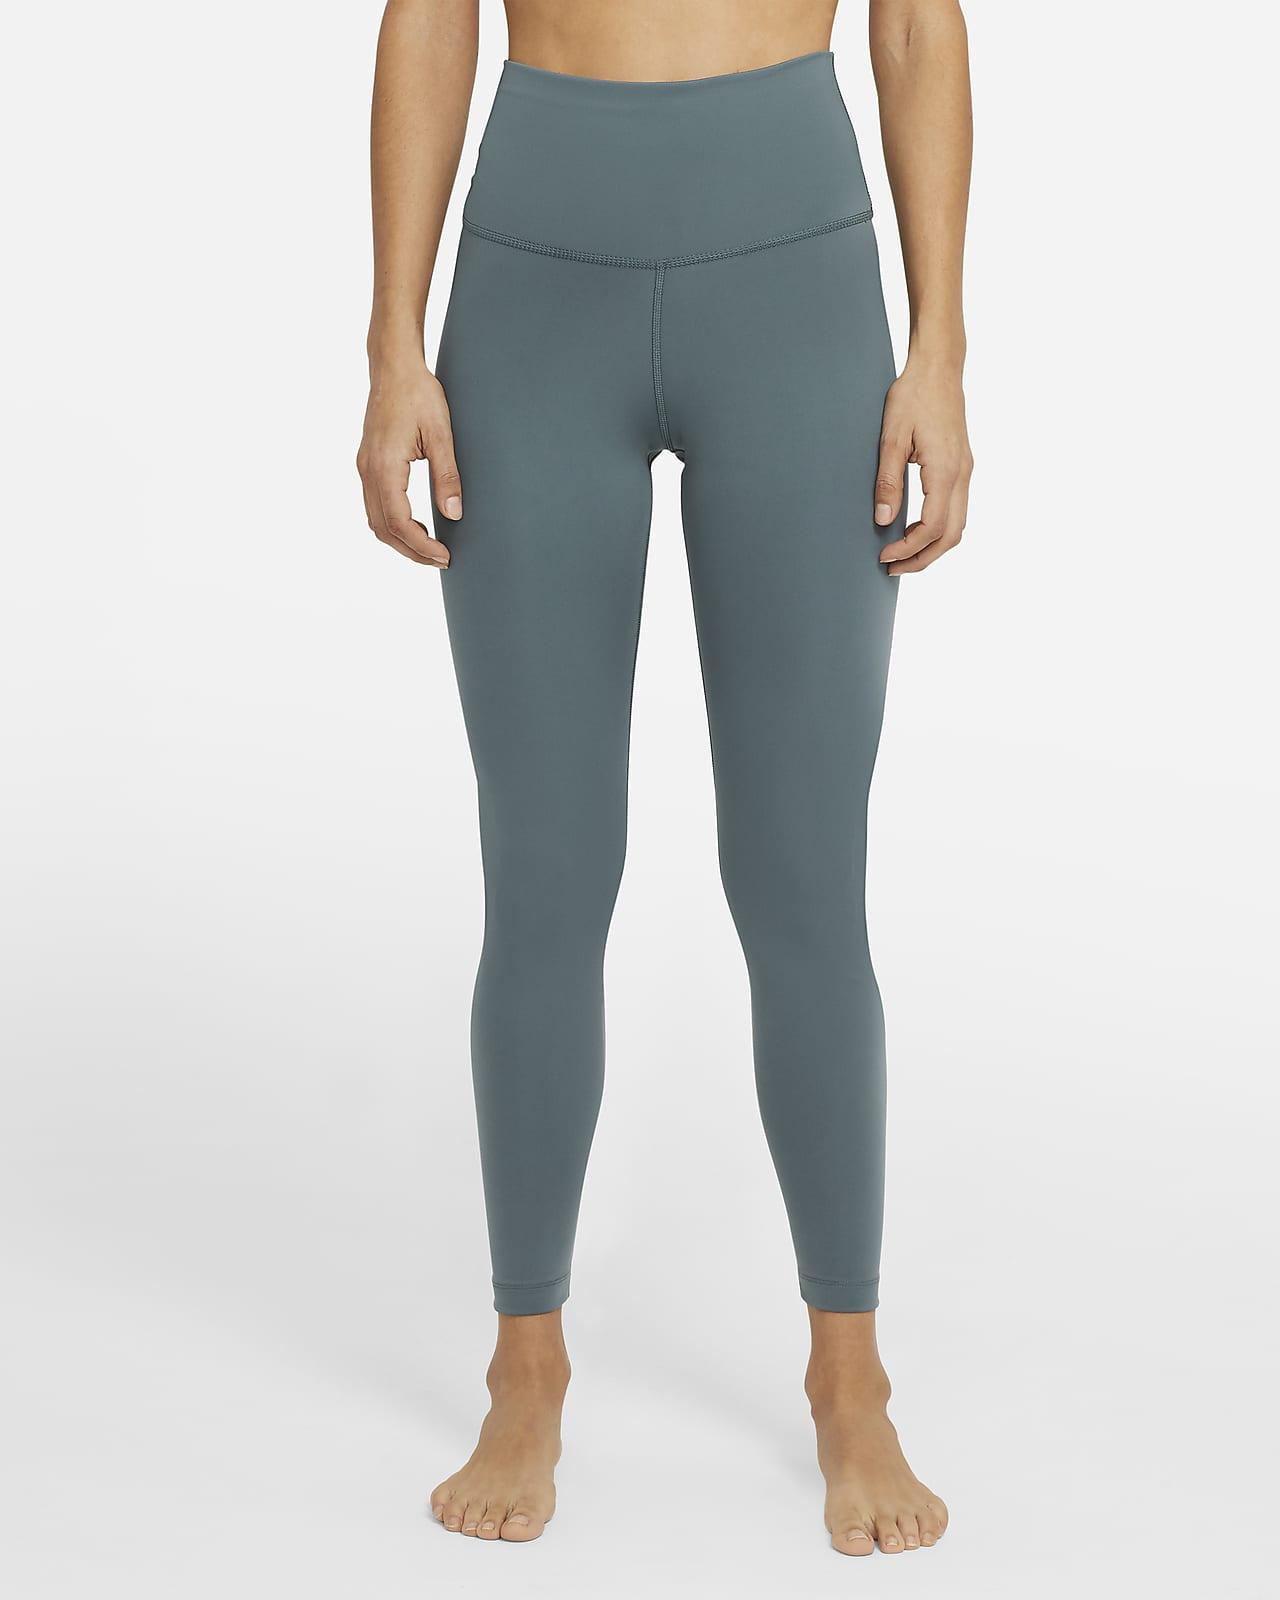 Nike Yoga 7/8-legging voor dames